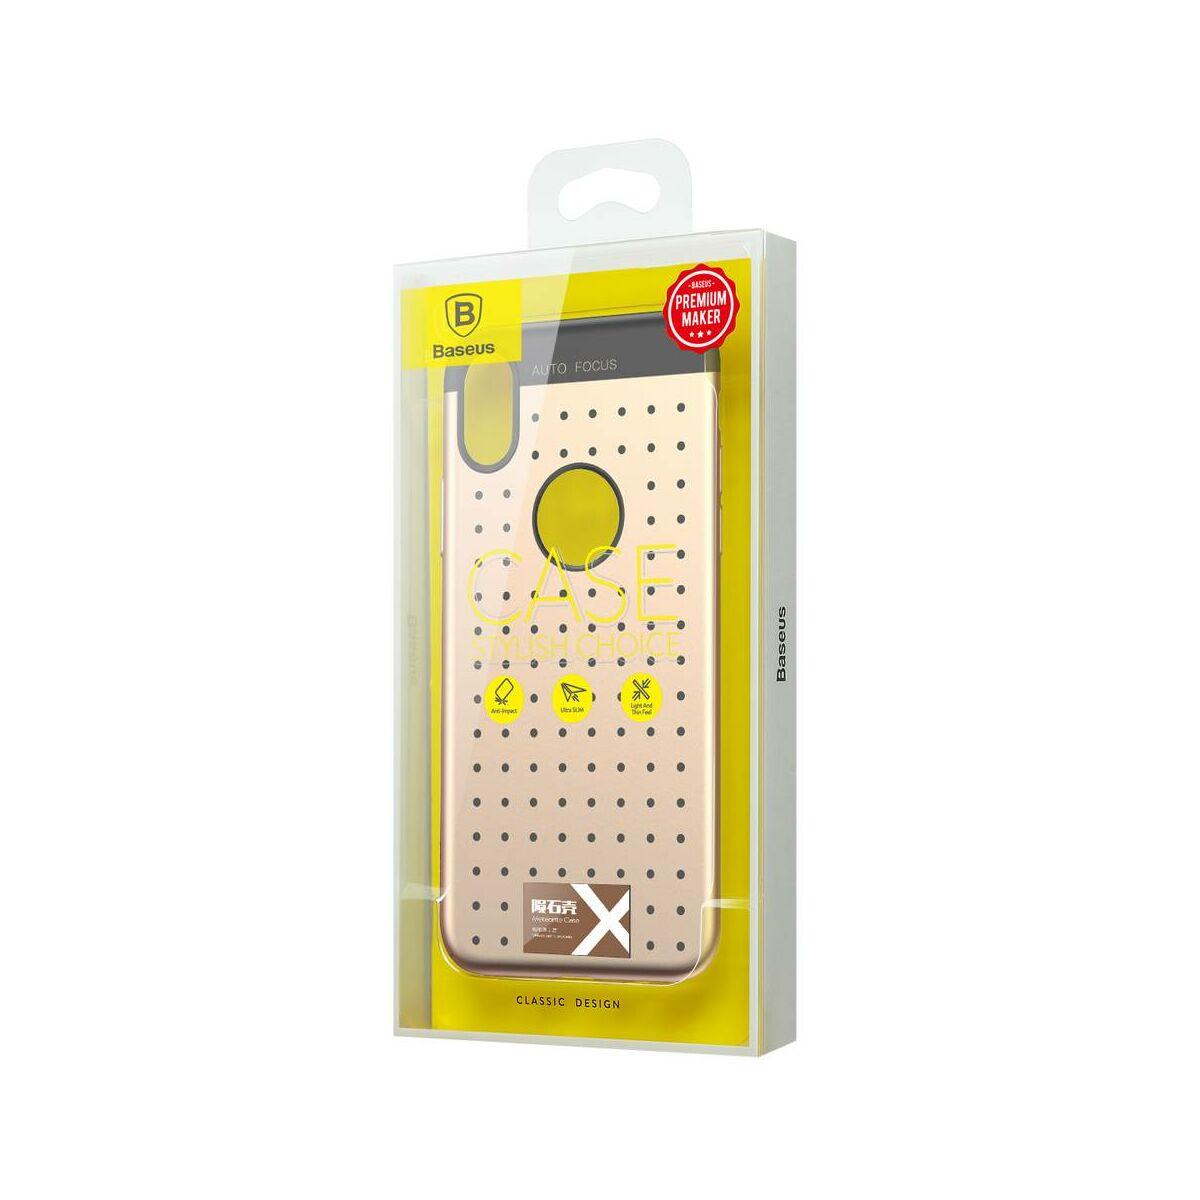 Baseus iPhone X/XS tok, Star lighting, arany (WIAPIPHX-ST0V)